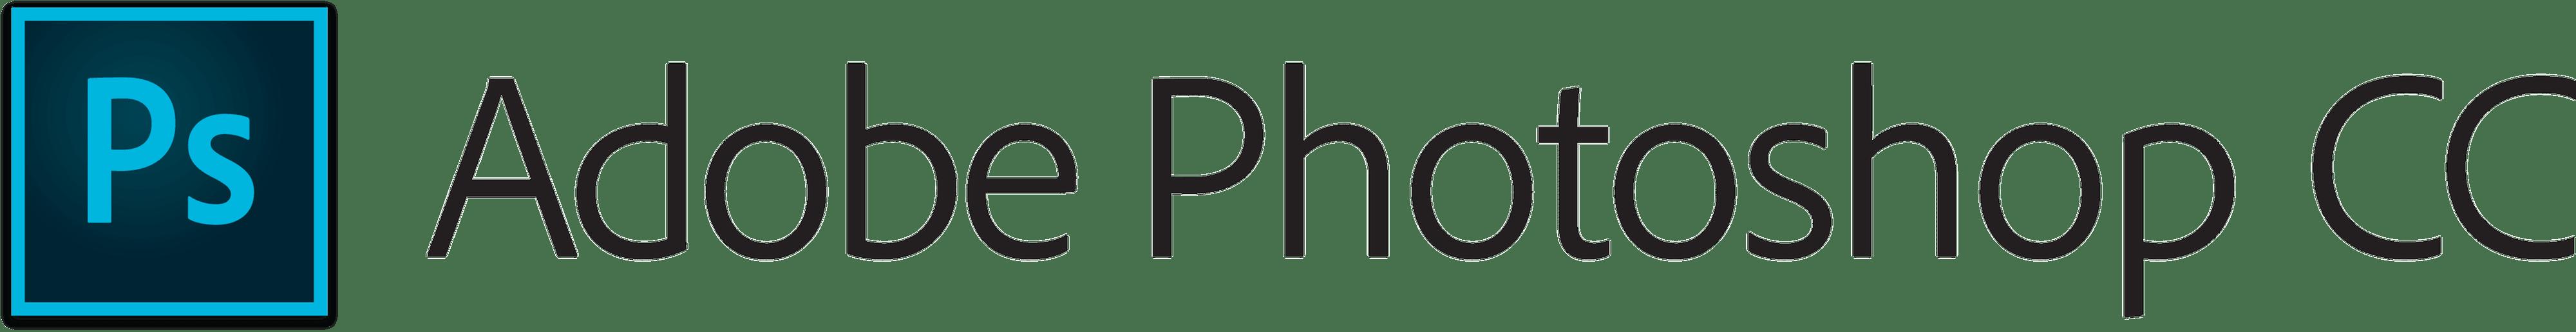 Adobe_Photoshop_CC_logotype_with_logo_CMYK